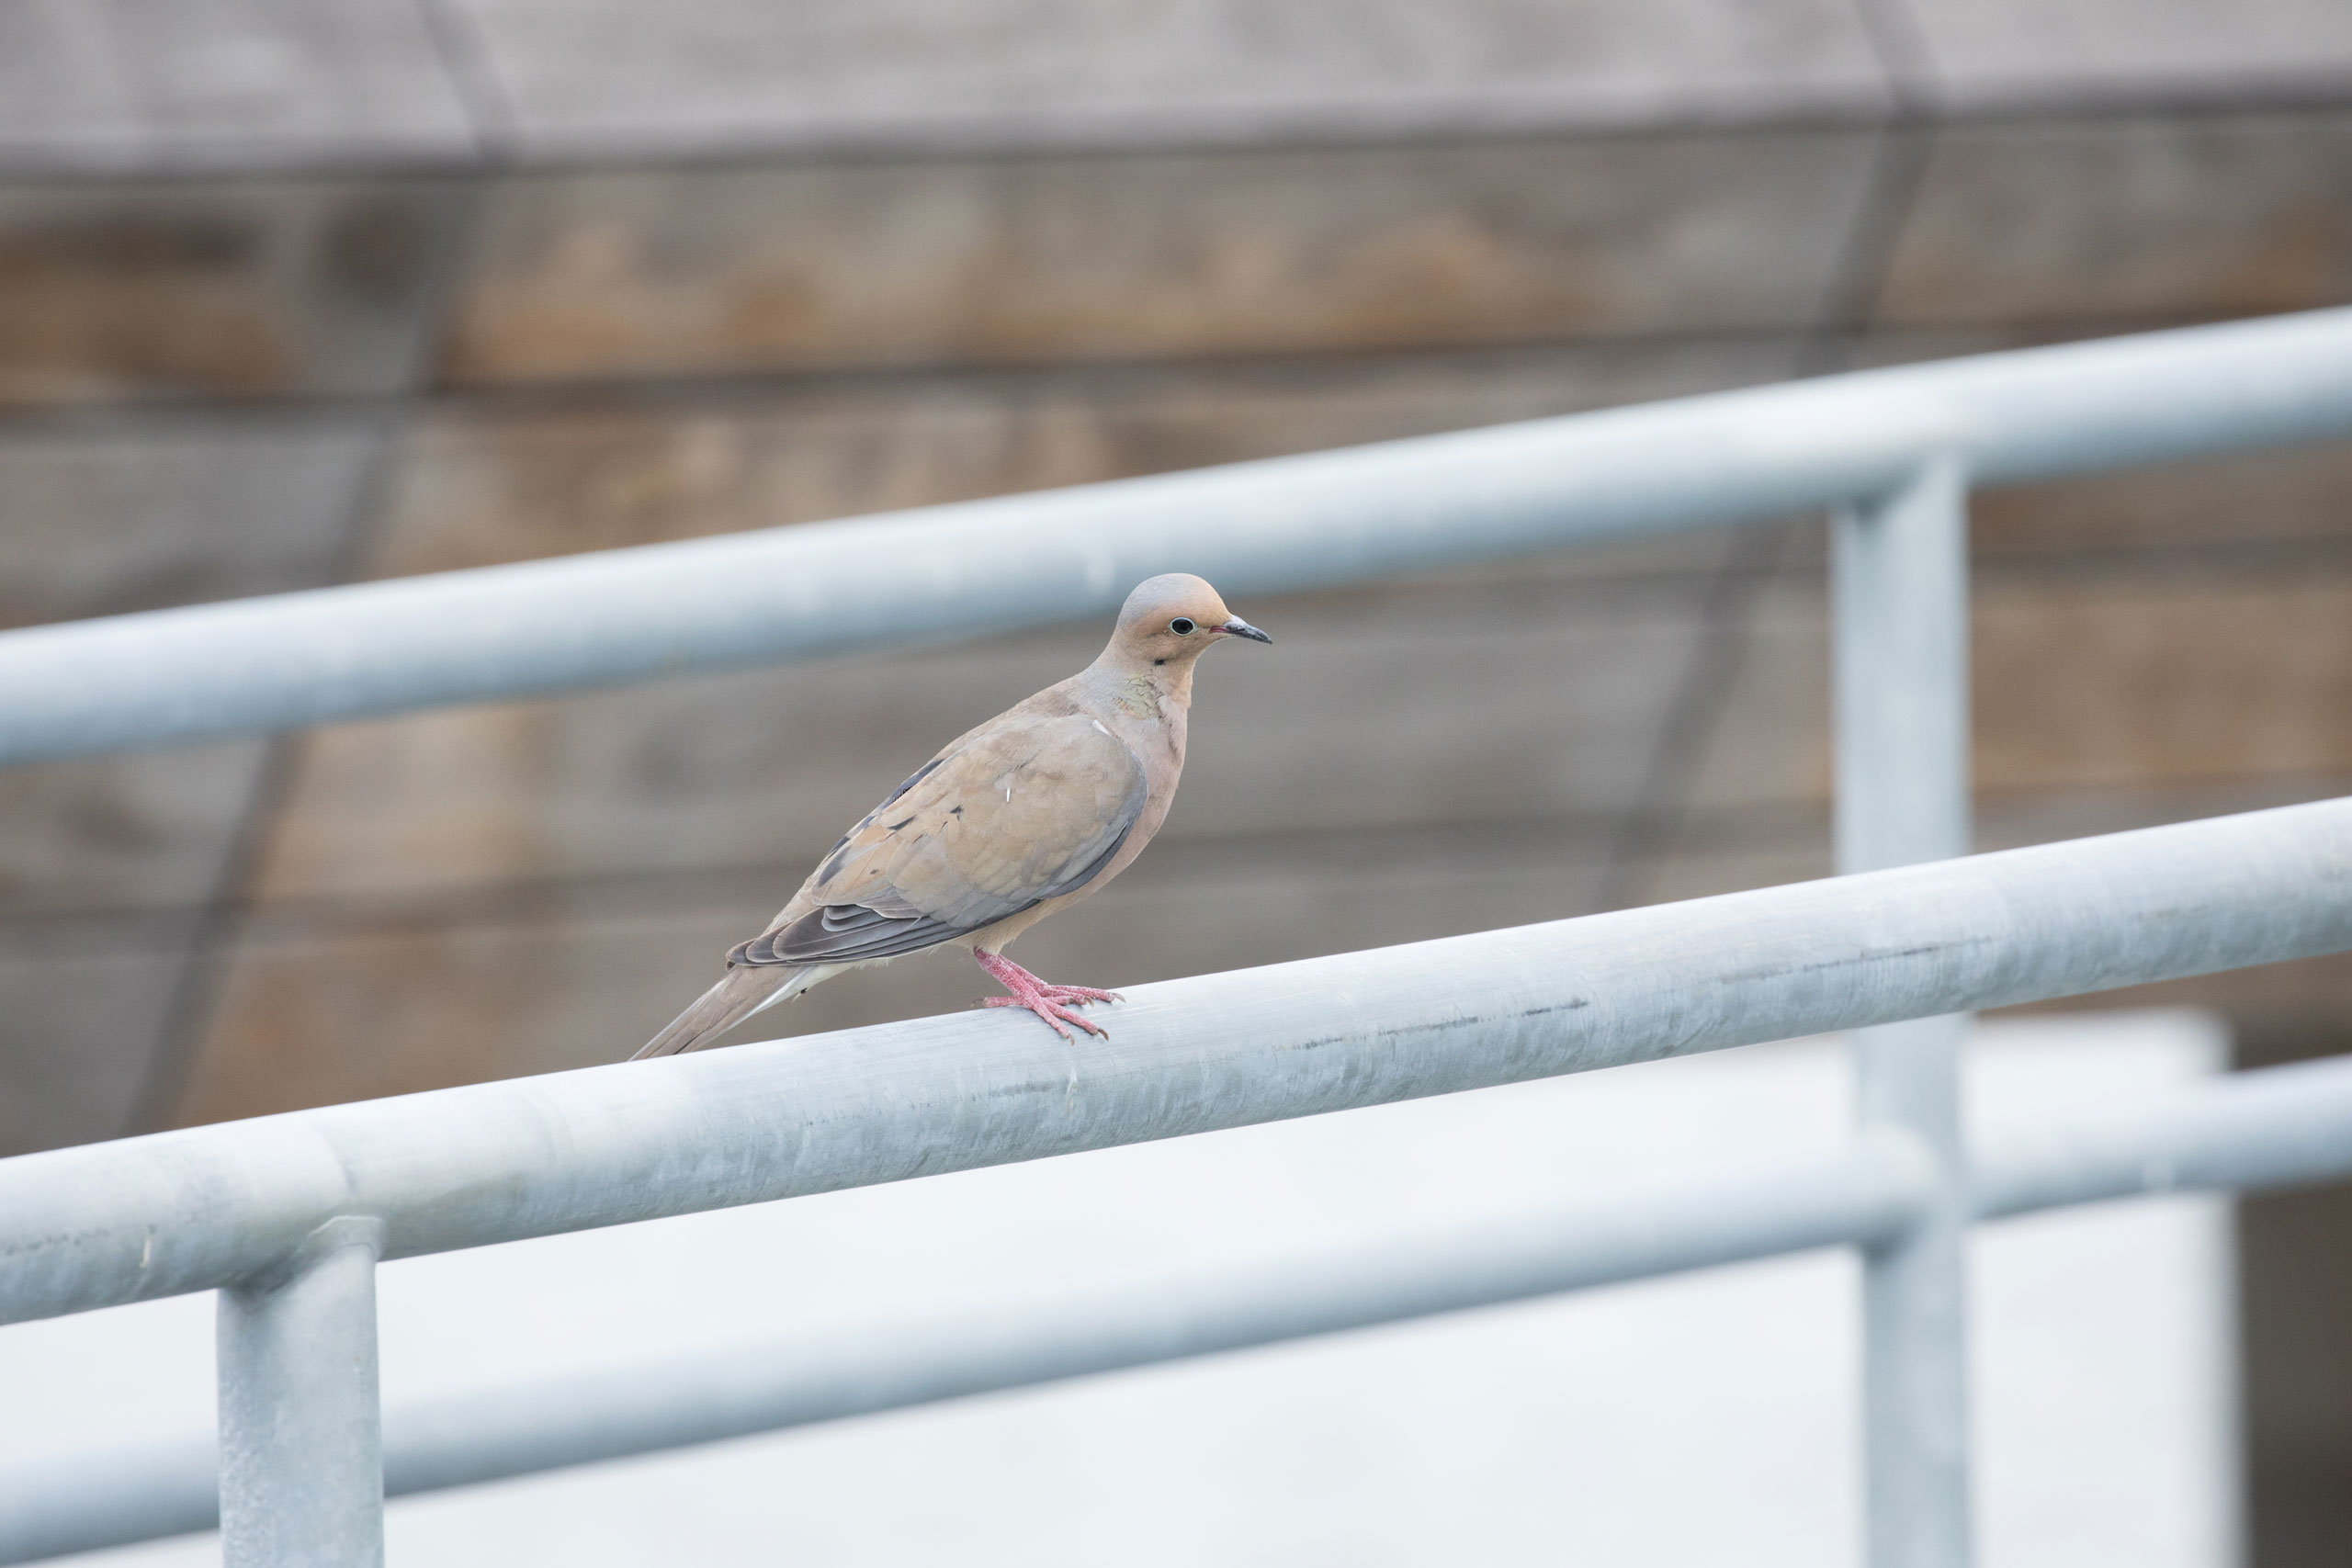 Bird perched on railings of the HRPK Pier 26 Tide Deck in Hudson River Park